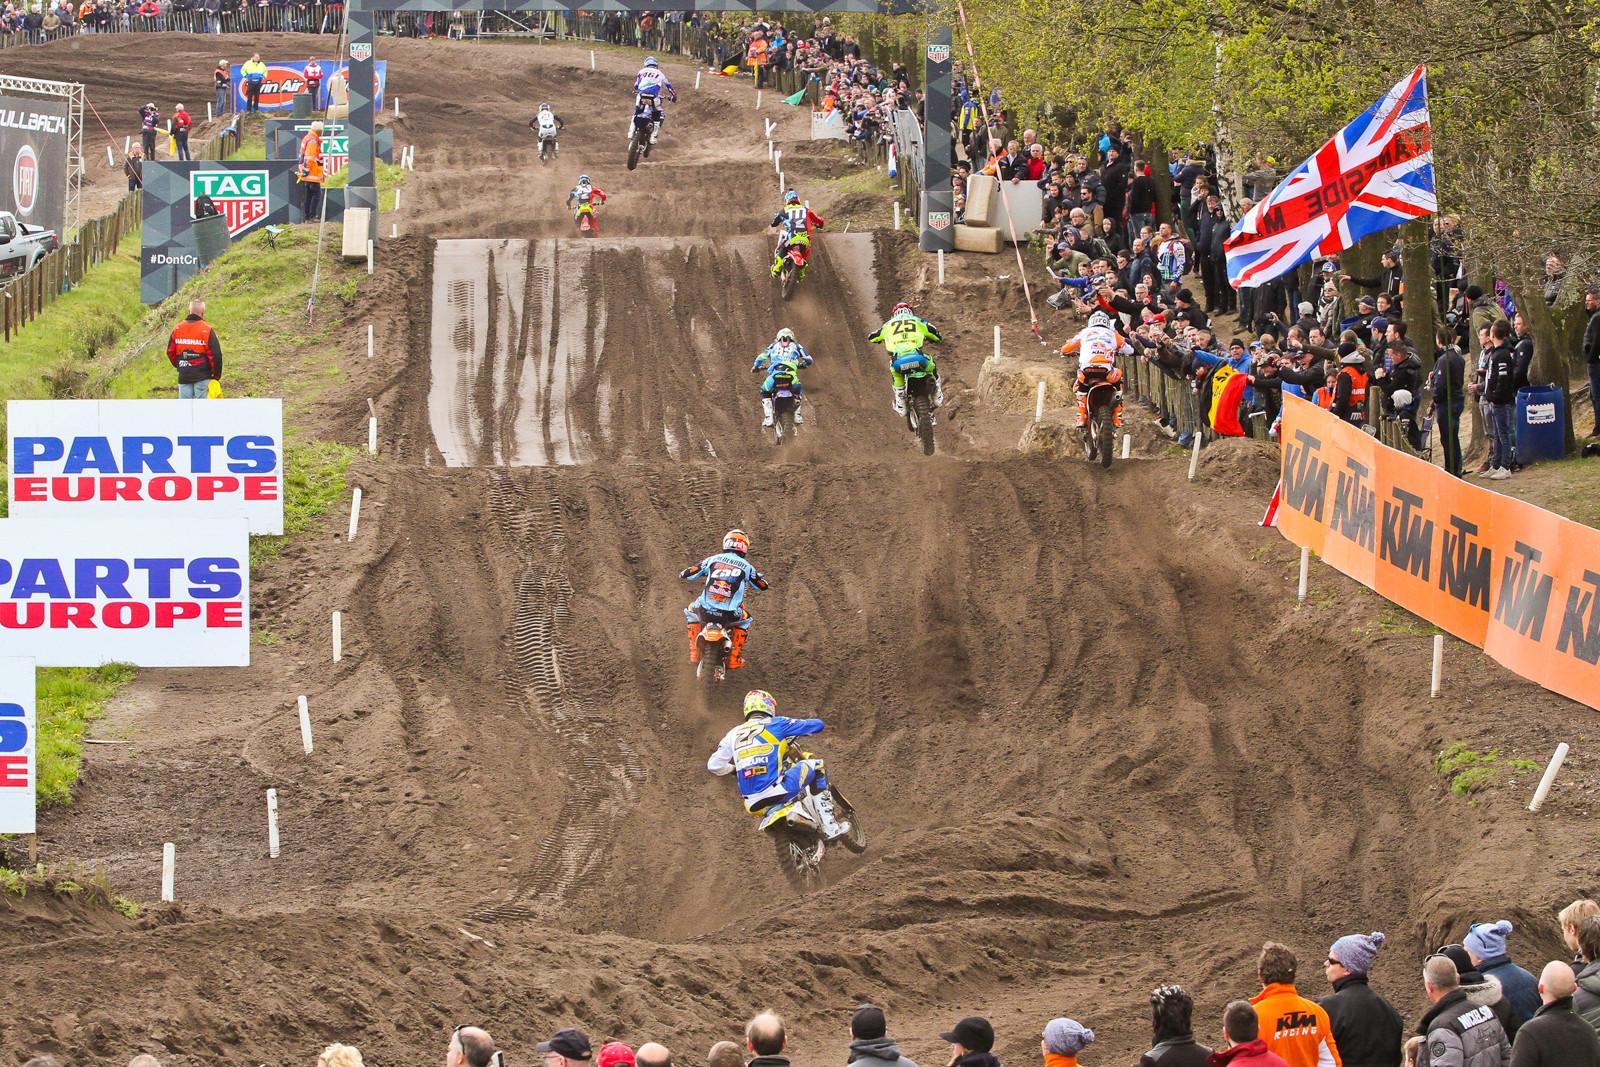 MXGP Battling - Photo Blast: 2017 MXGP of Valkenswaard - Motocross Pictures - Vital MX